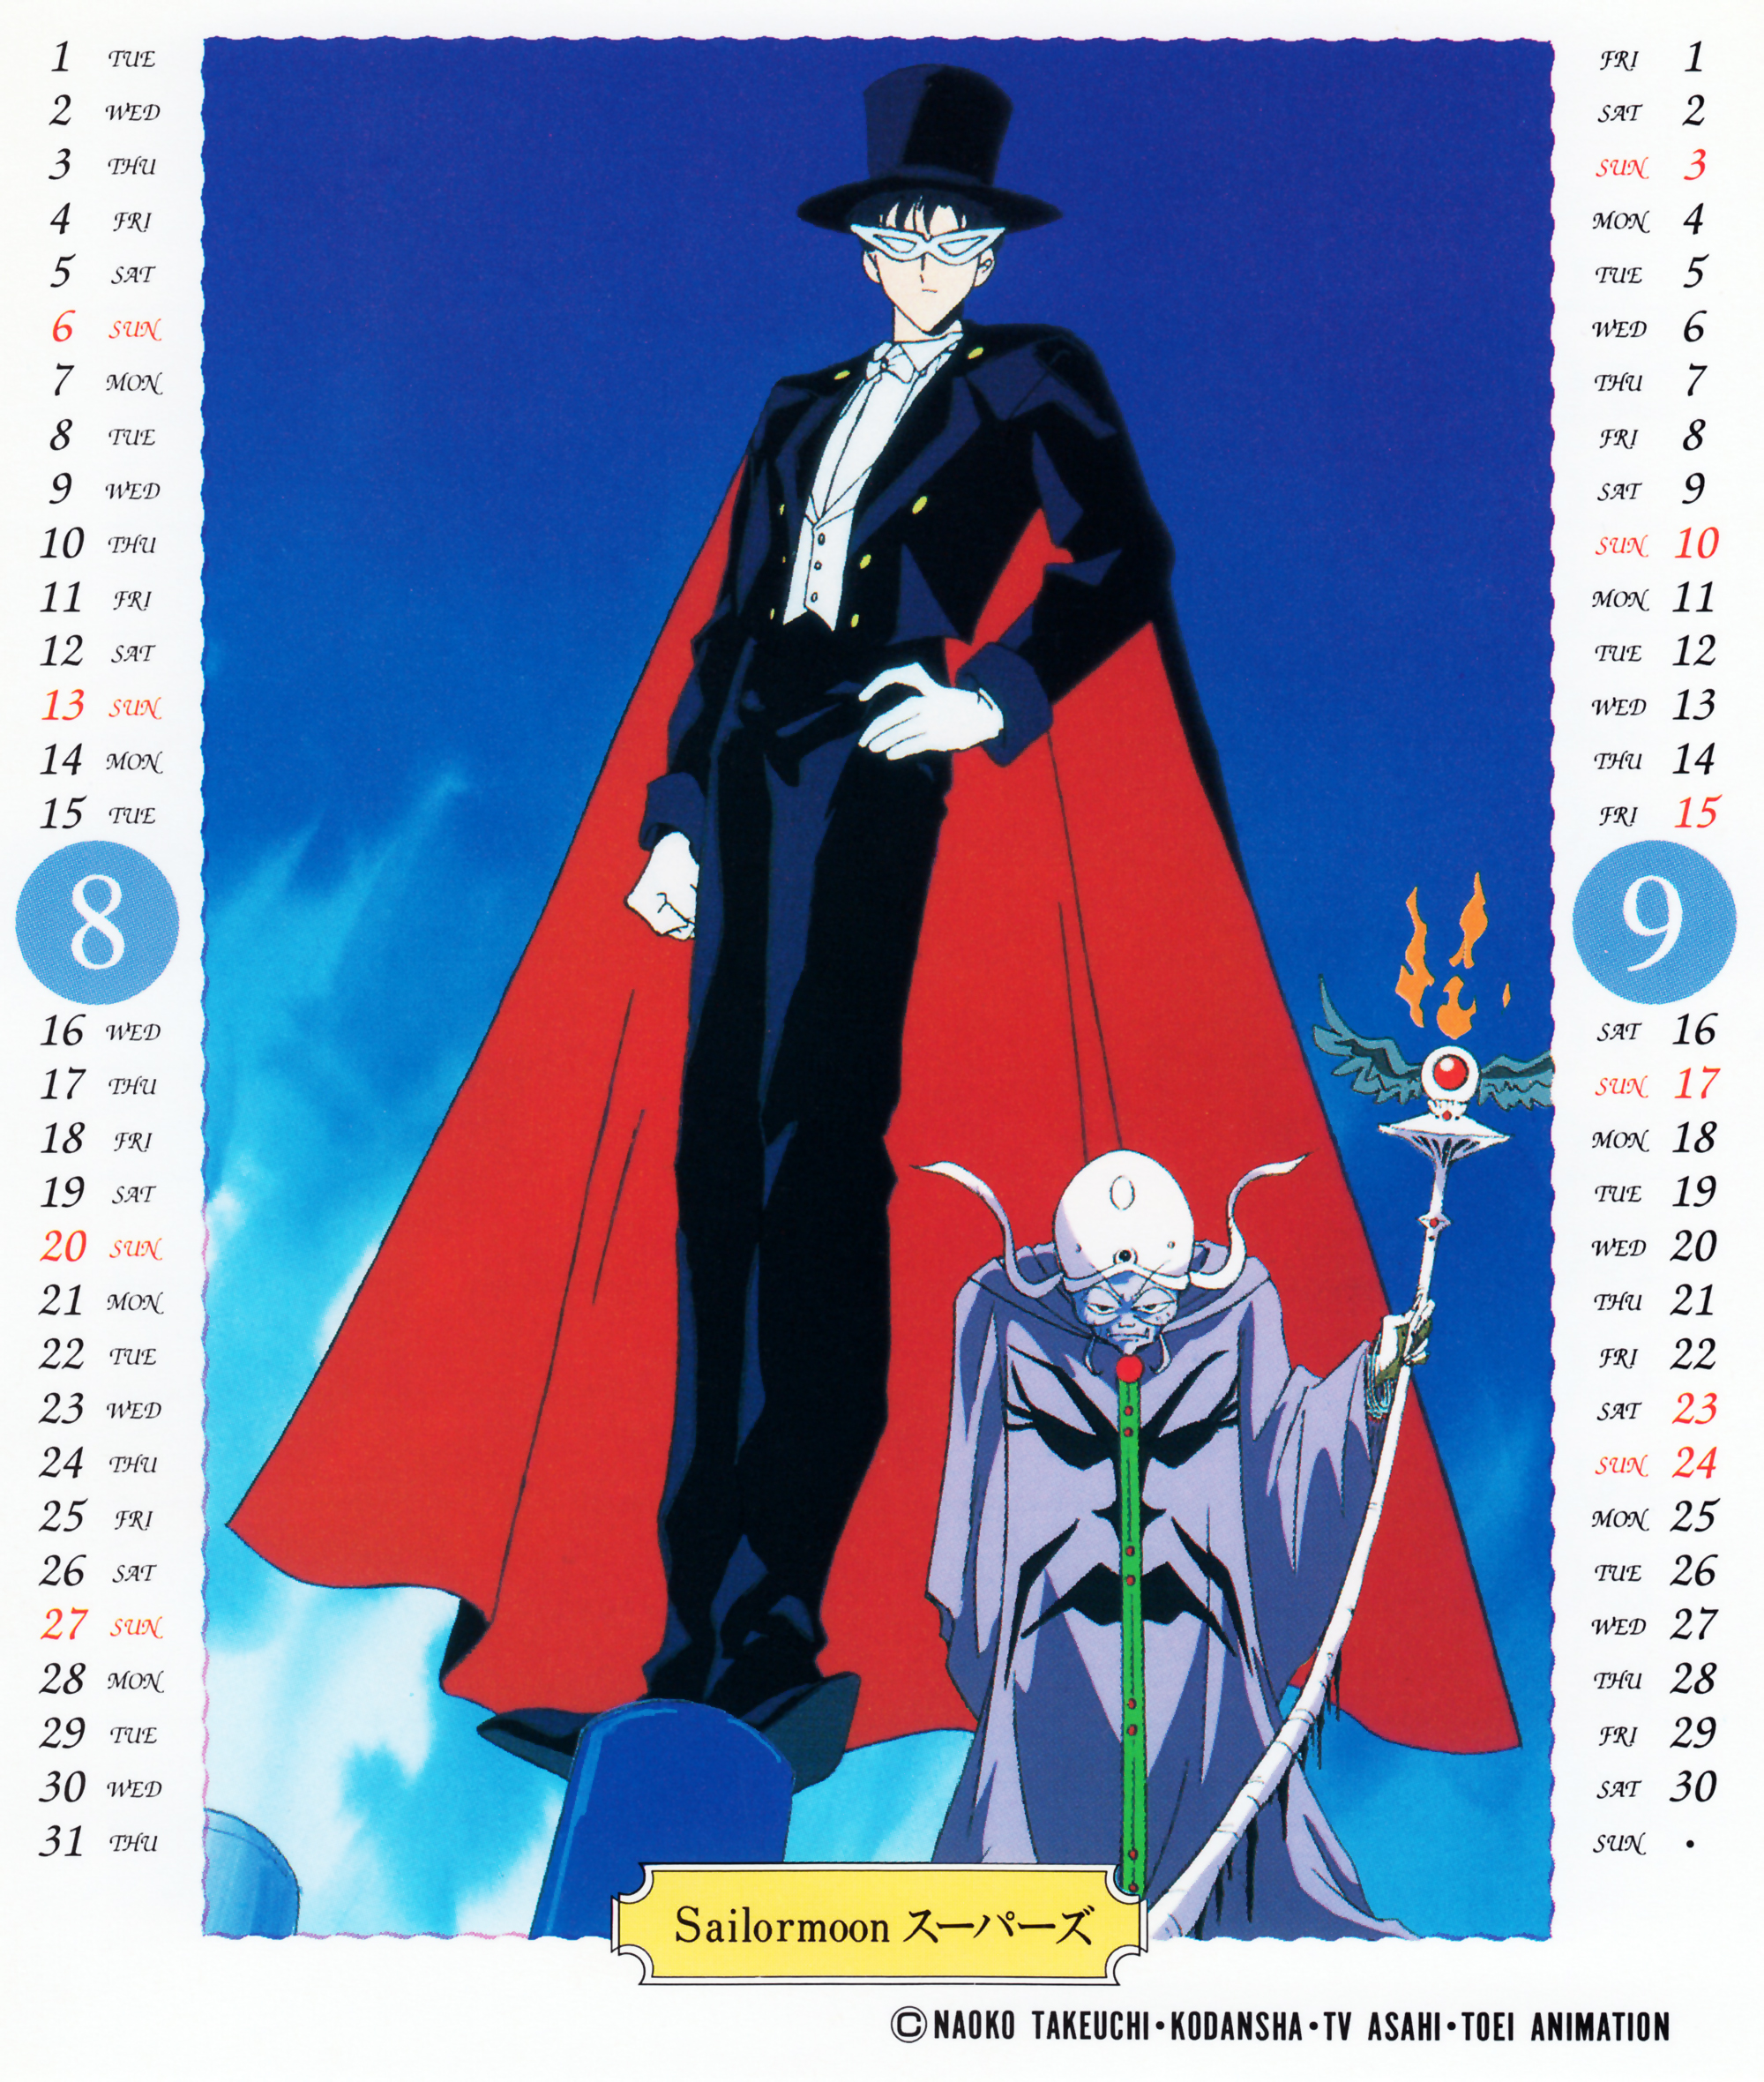 Sailor-moon-ss-schoolyear-calendar-05